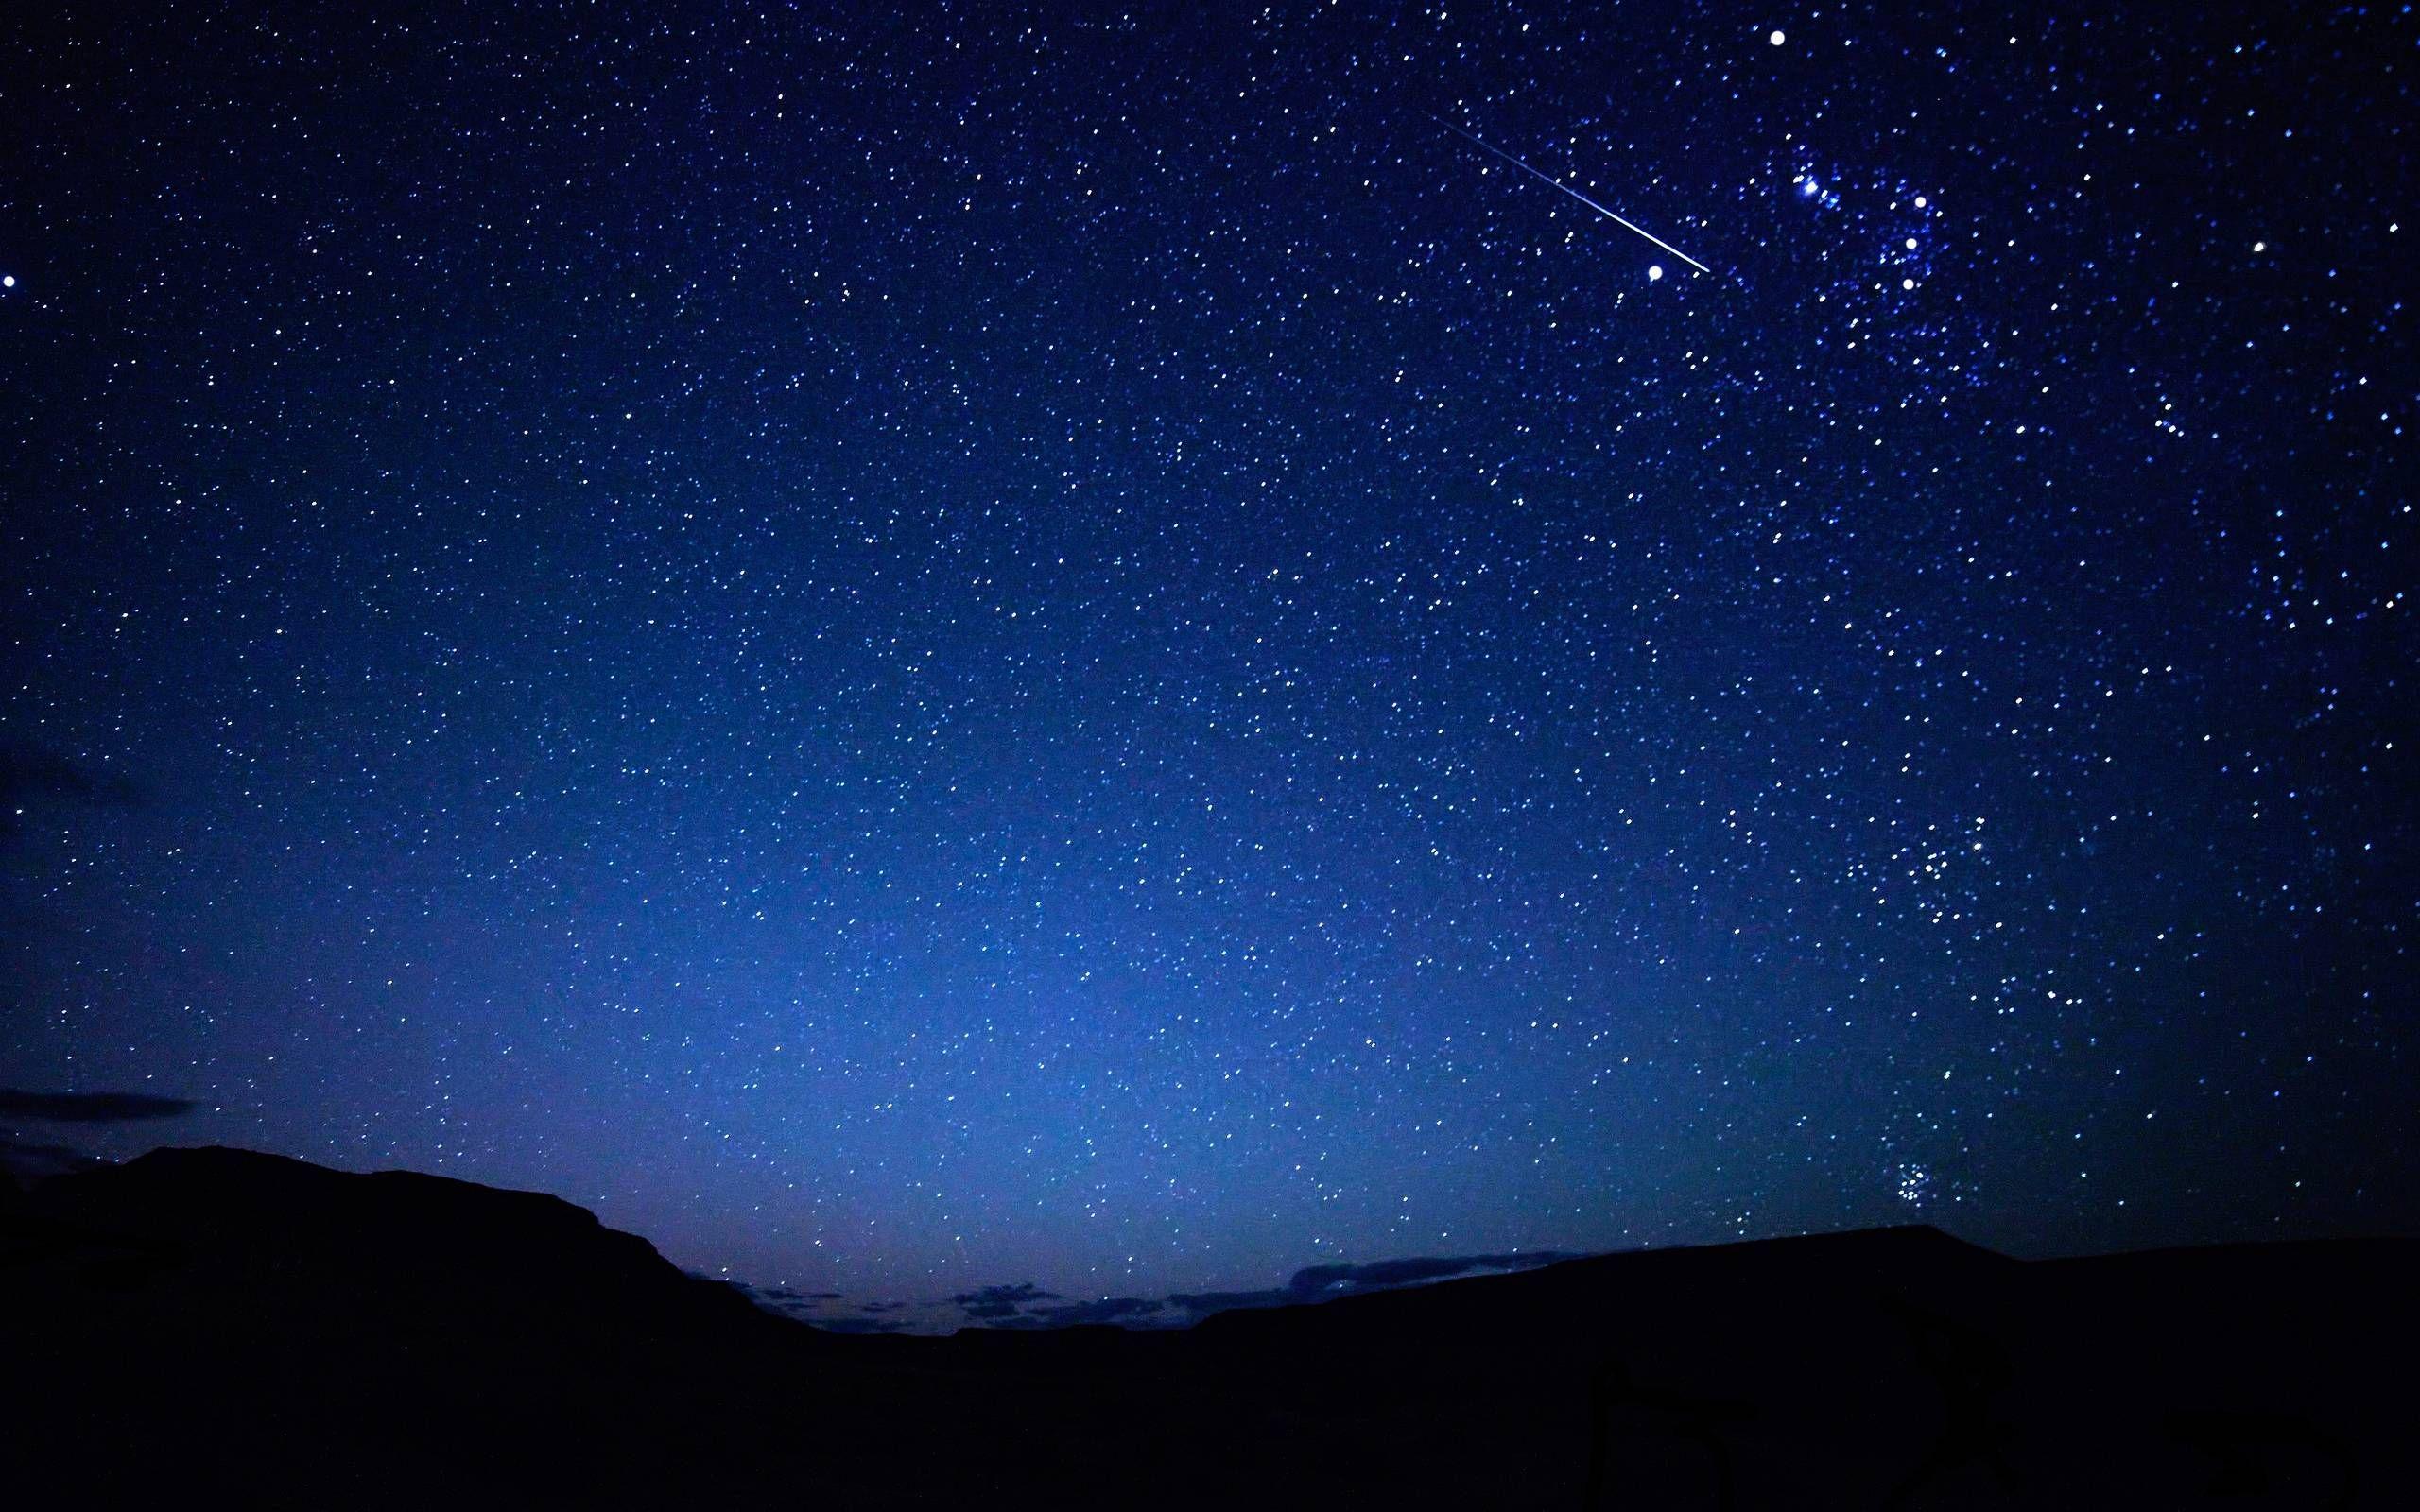 Pin By Alicja Depczynska On Almost Maine Night Sky Wallpaper Starry Night Wallpaper Night Sky Hd